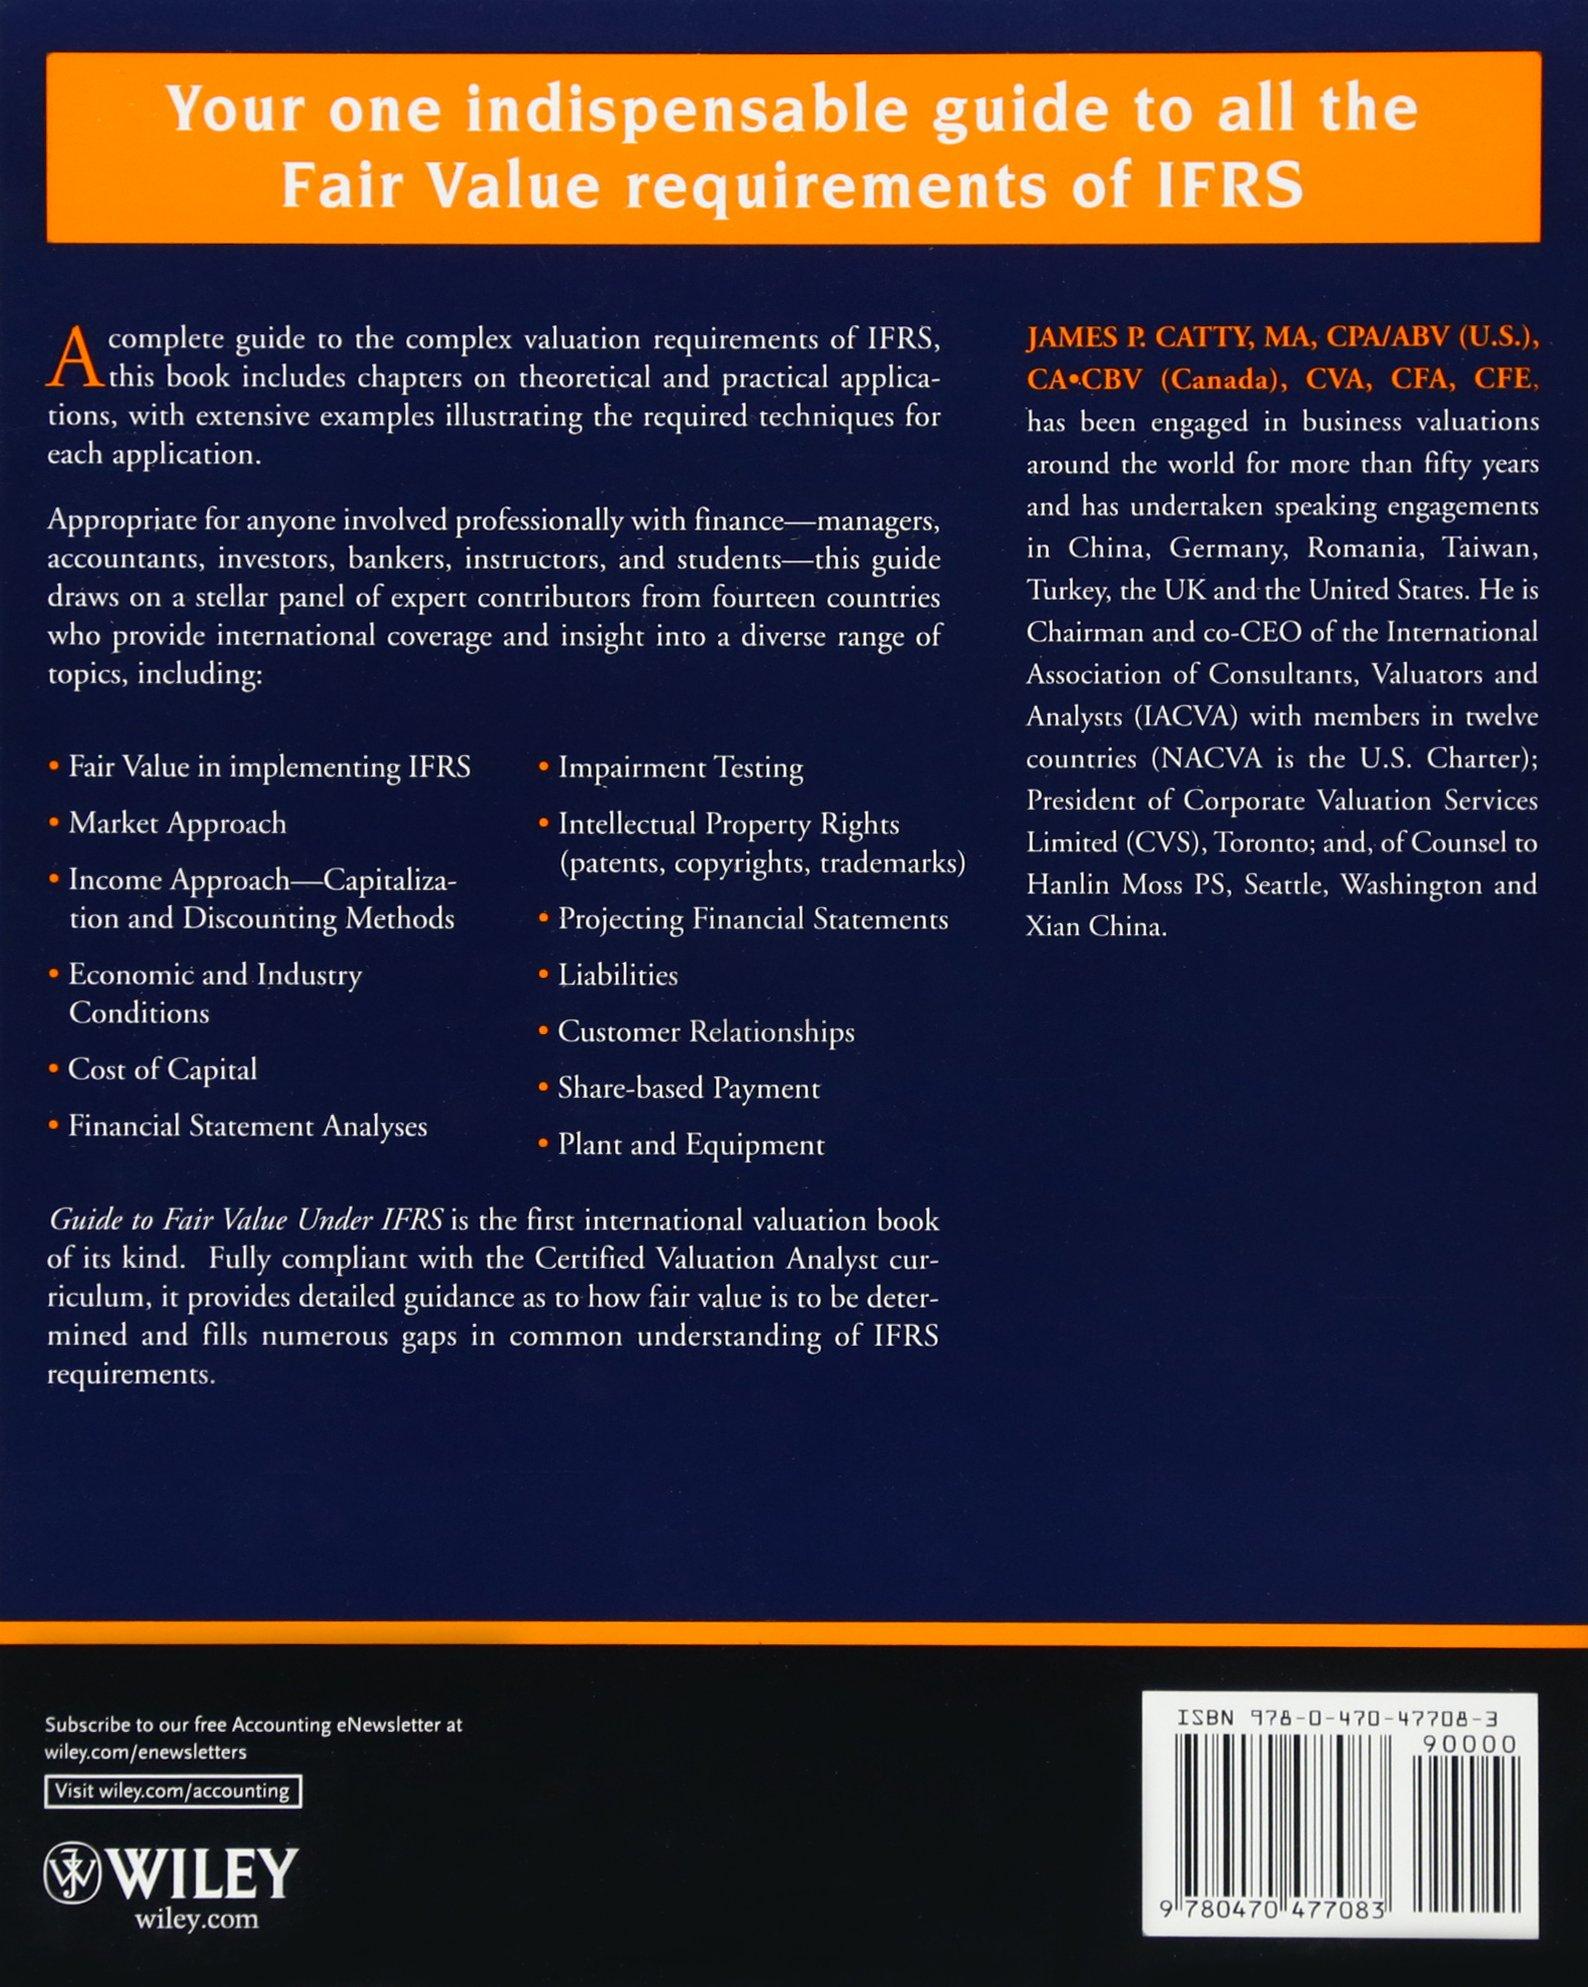 Wiley Guide to Fair Value Under IFRS: Amazon.de: James P. Catty:  Fremdsprachige Bücher